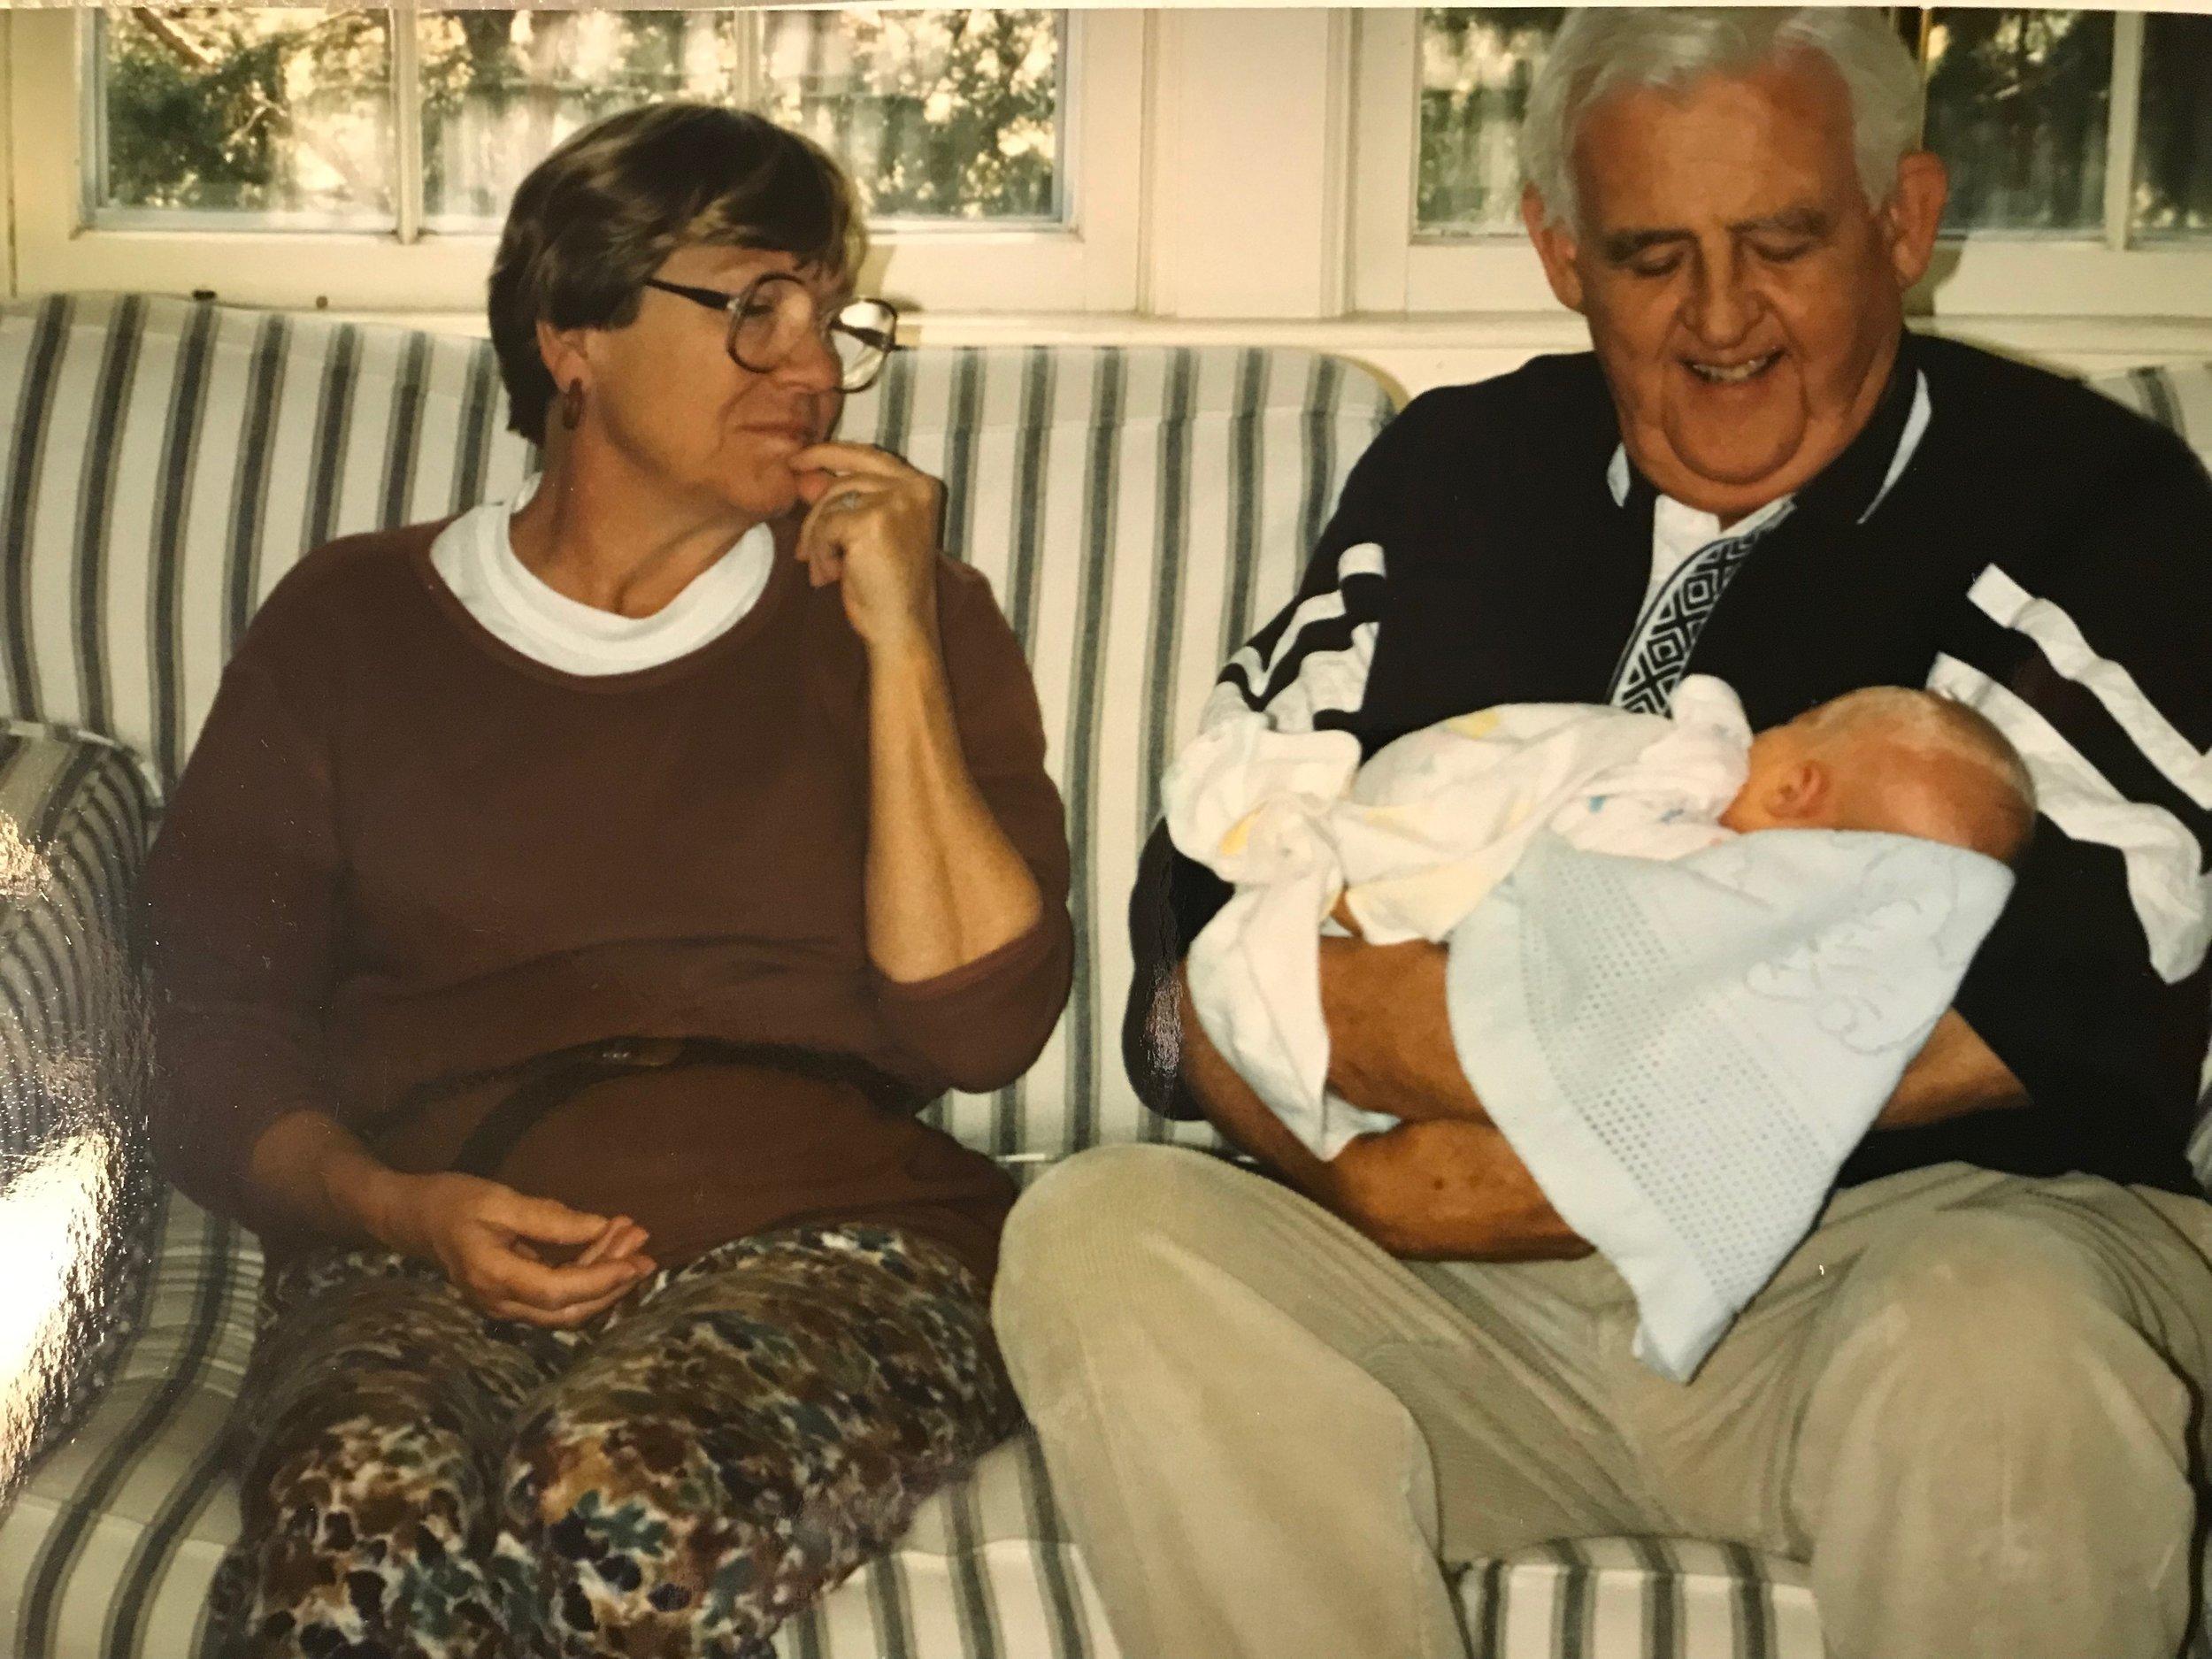 Grandma and Grandpa meeting Ellen